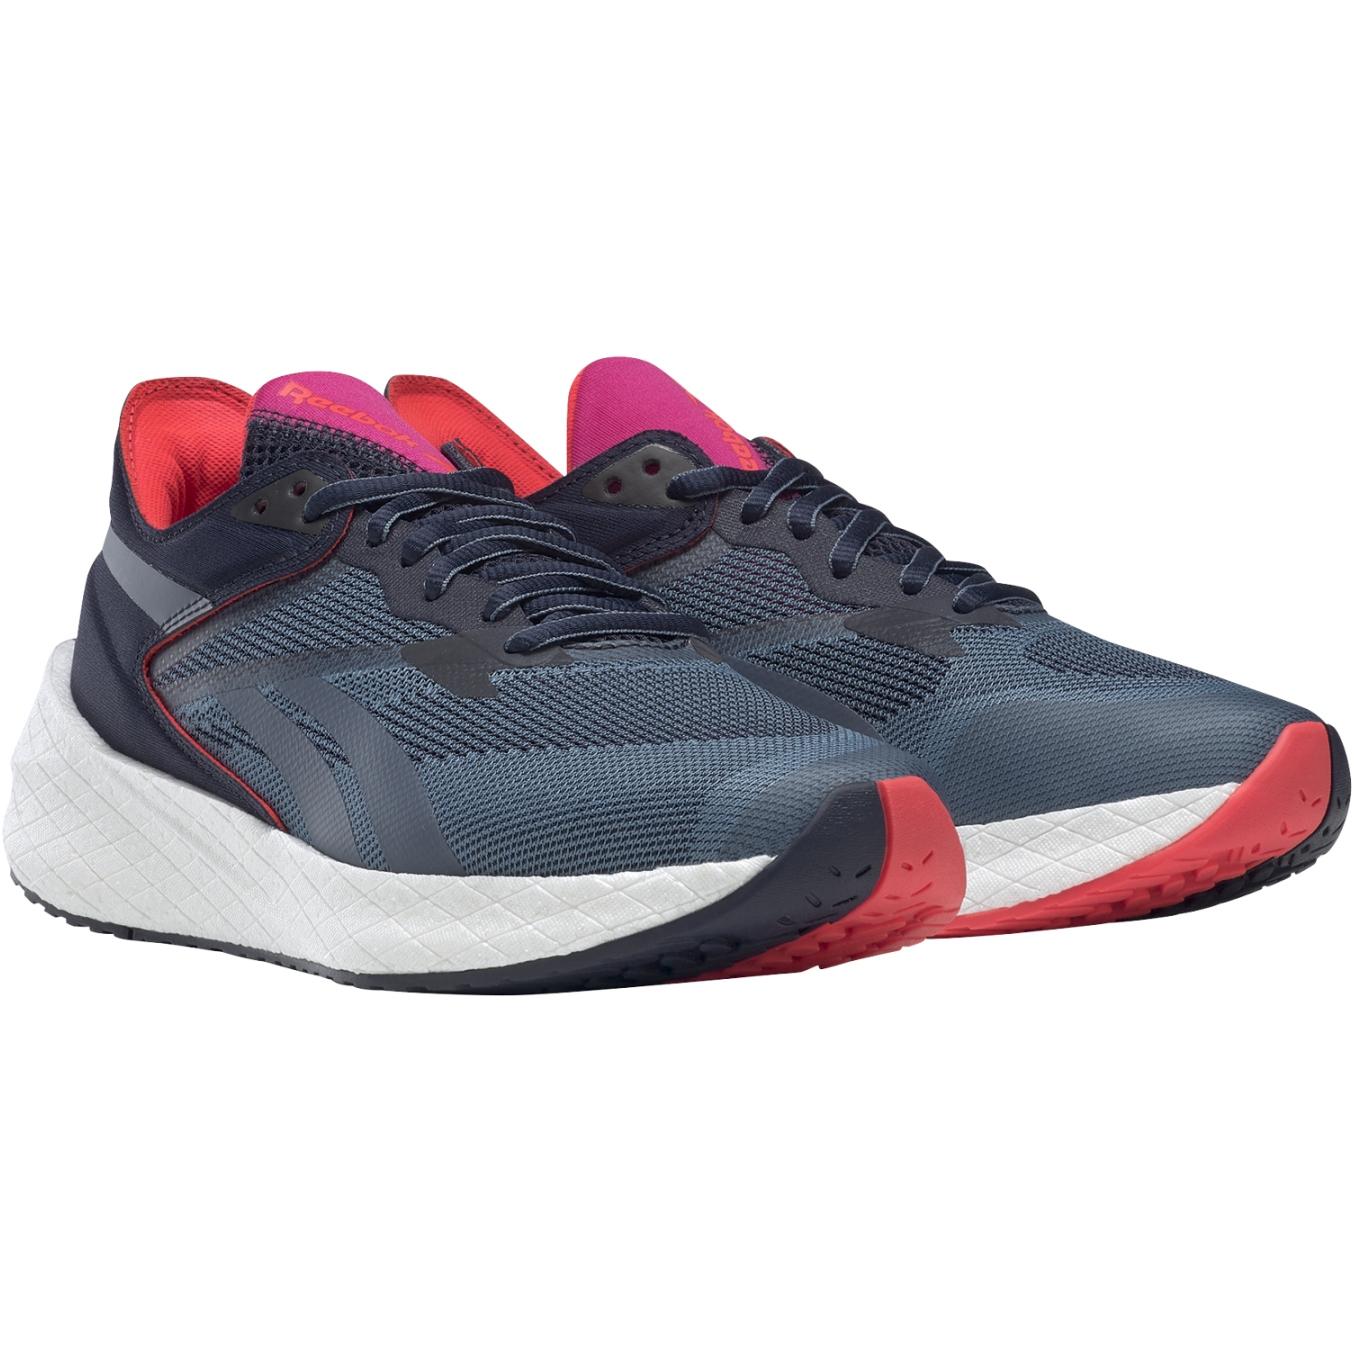 Reebok Floatride Energy Symmetros Women's Shoes - vector navy / blue slate / pursuit pink